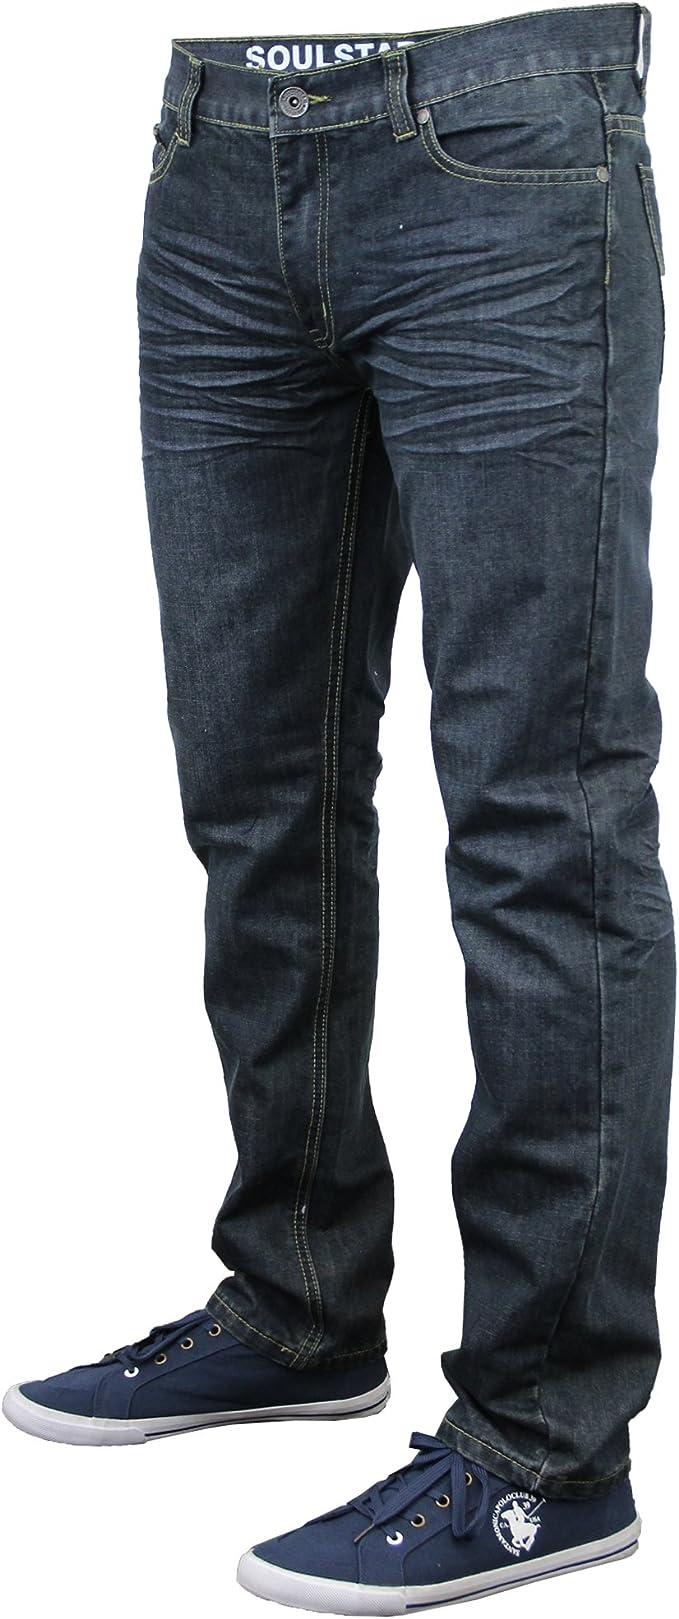 Brave Soul Men/'s Skinny Jeans Stretch Distressed Black Wash Denim Pants Size 34